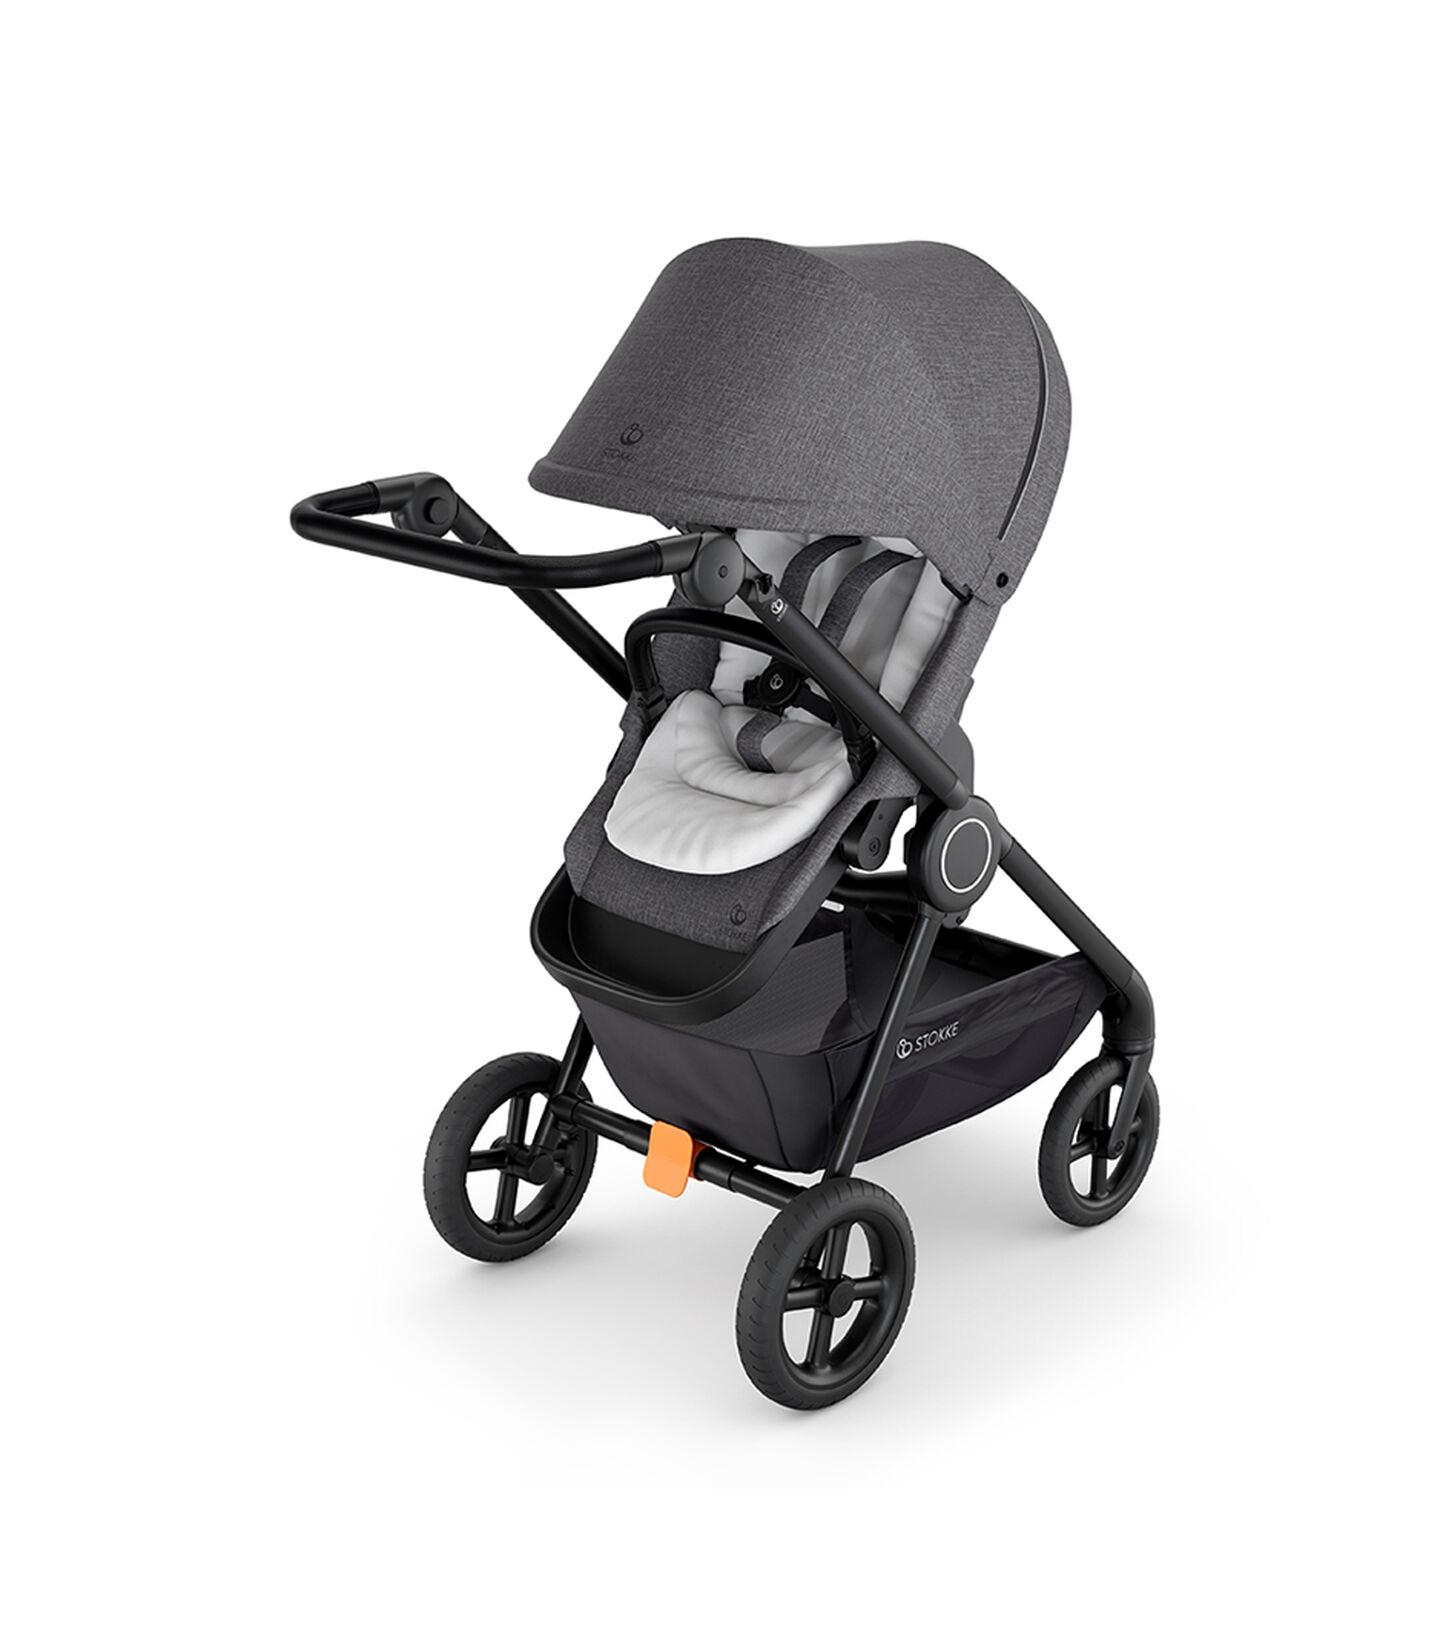 Stokke® Beat™ with Black Melange Seat and Stokke® Stroller Infant Insert White. view 2